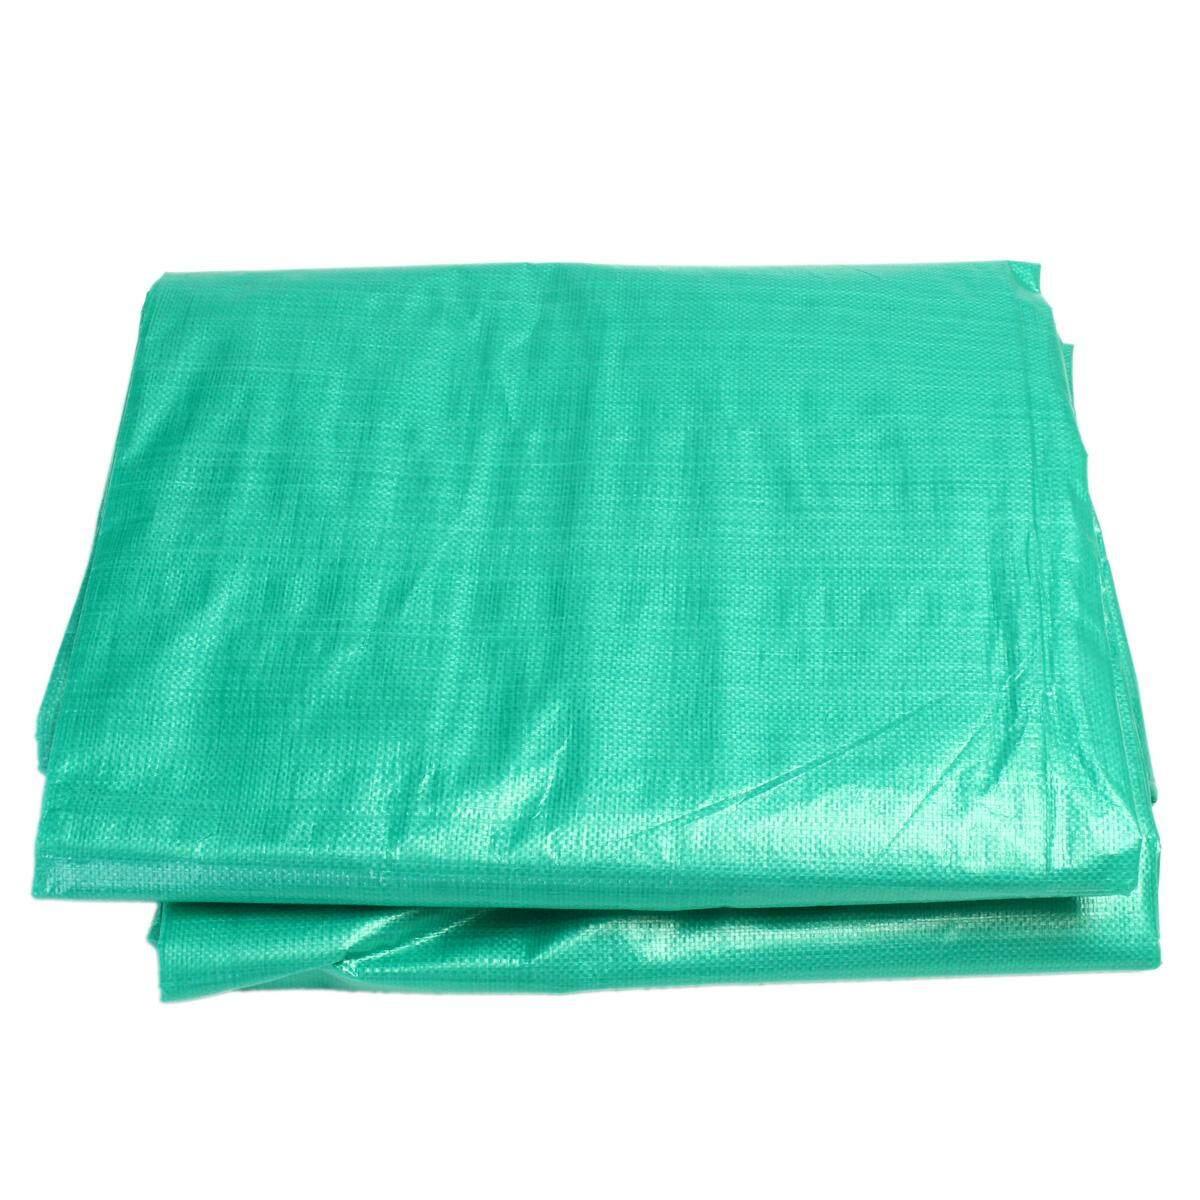 5.4x7.3m Large Camouflage Tarpaulin Waterproof Sheet Cover Canvas Ground Camo Hunting Fishing